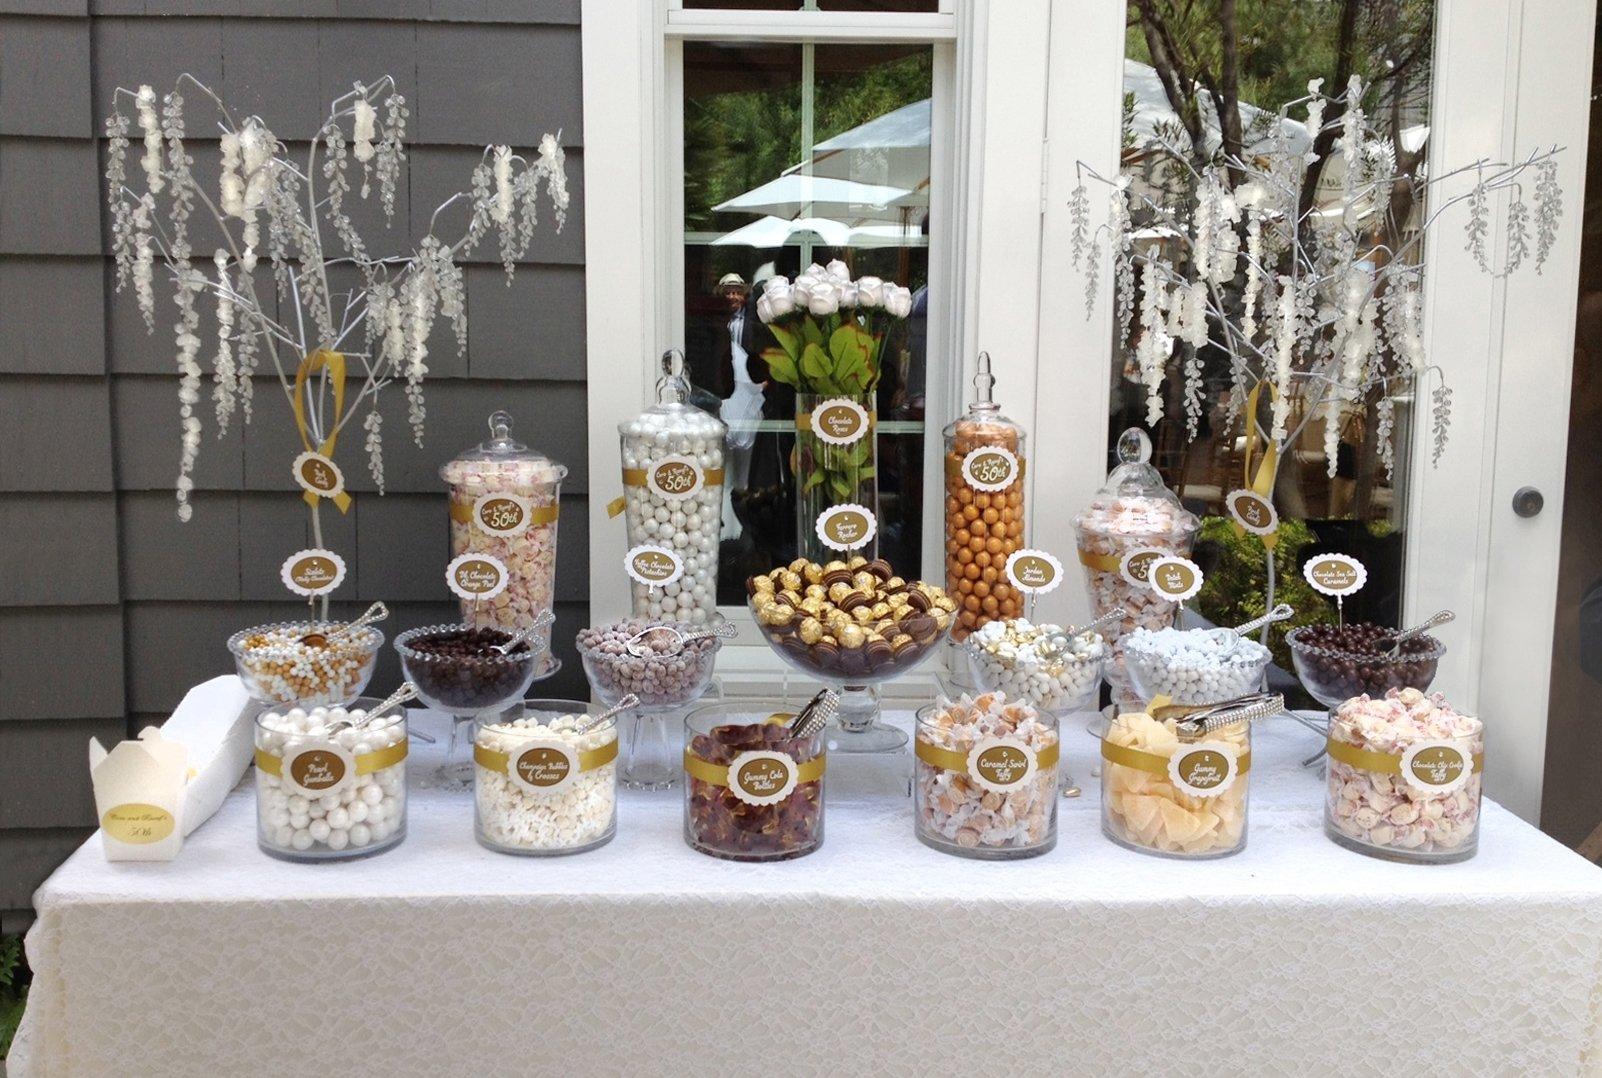 10 Attractive Ideas For 50Th Wedding Anniversary 50th wedding anniversary party ideas food low budget 50th wedding 1 2020